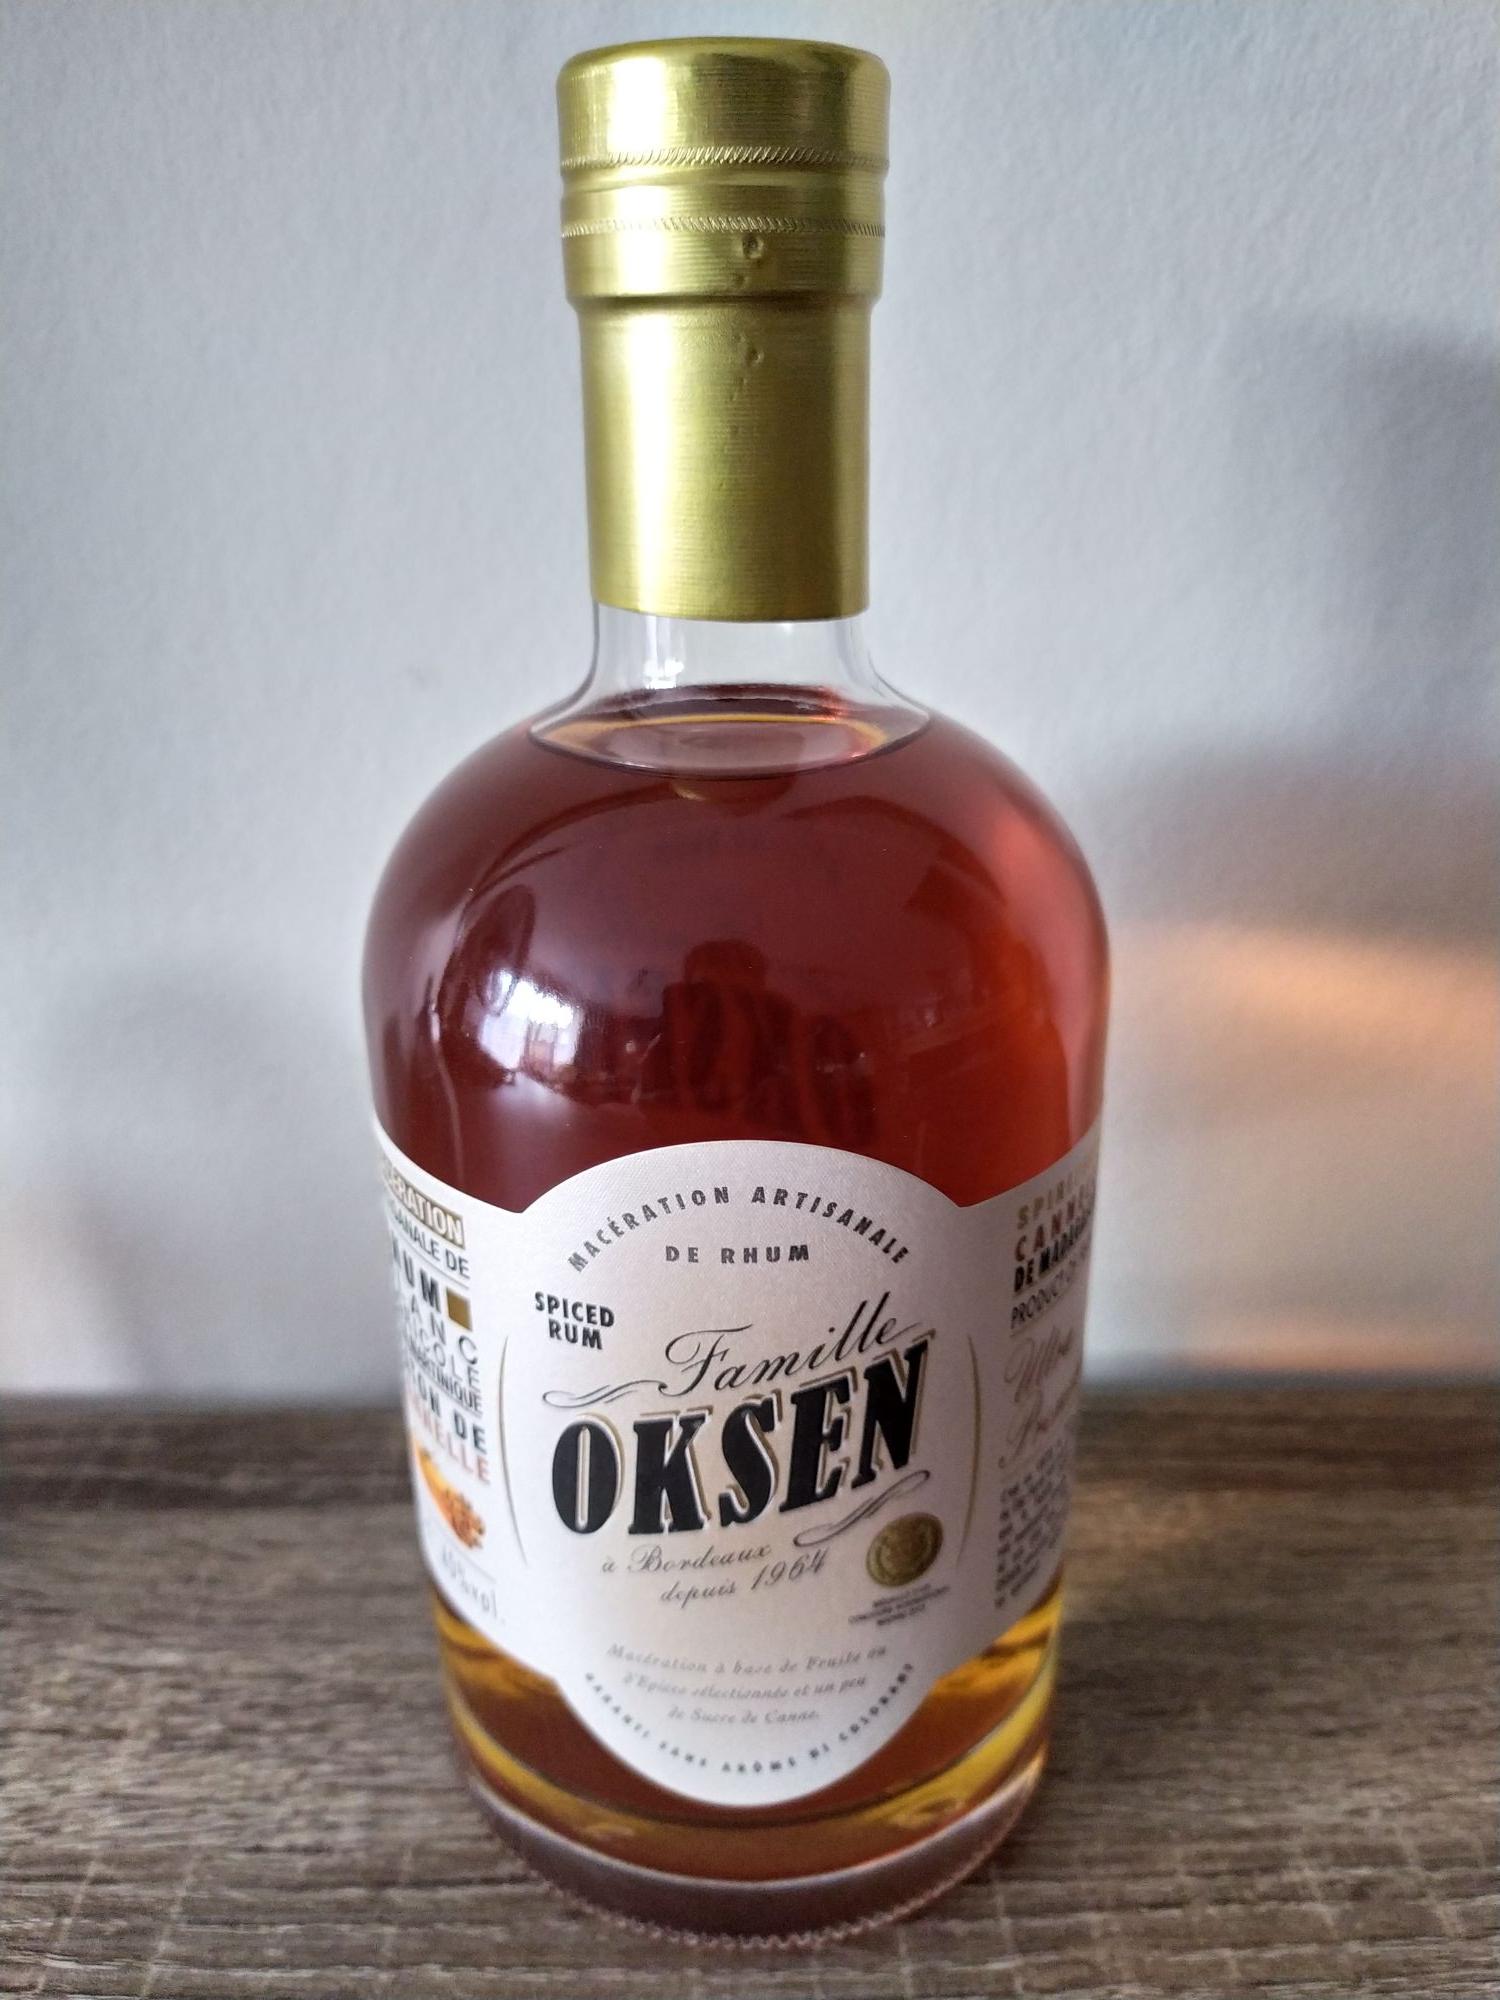 Bouteille de Rhum Oksen Spiced rum - 70cl, Canelle, ID Stock englos (59)